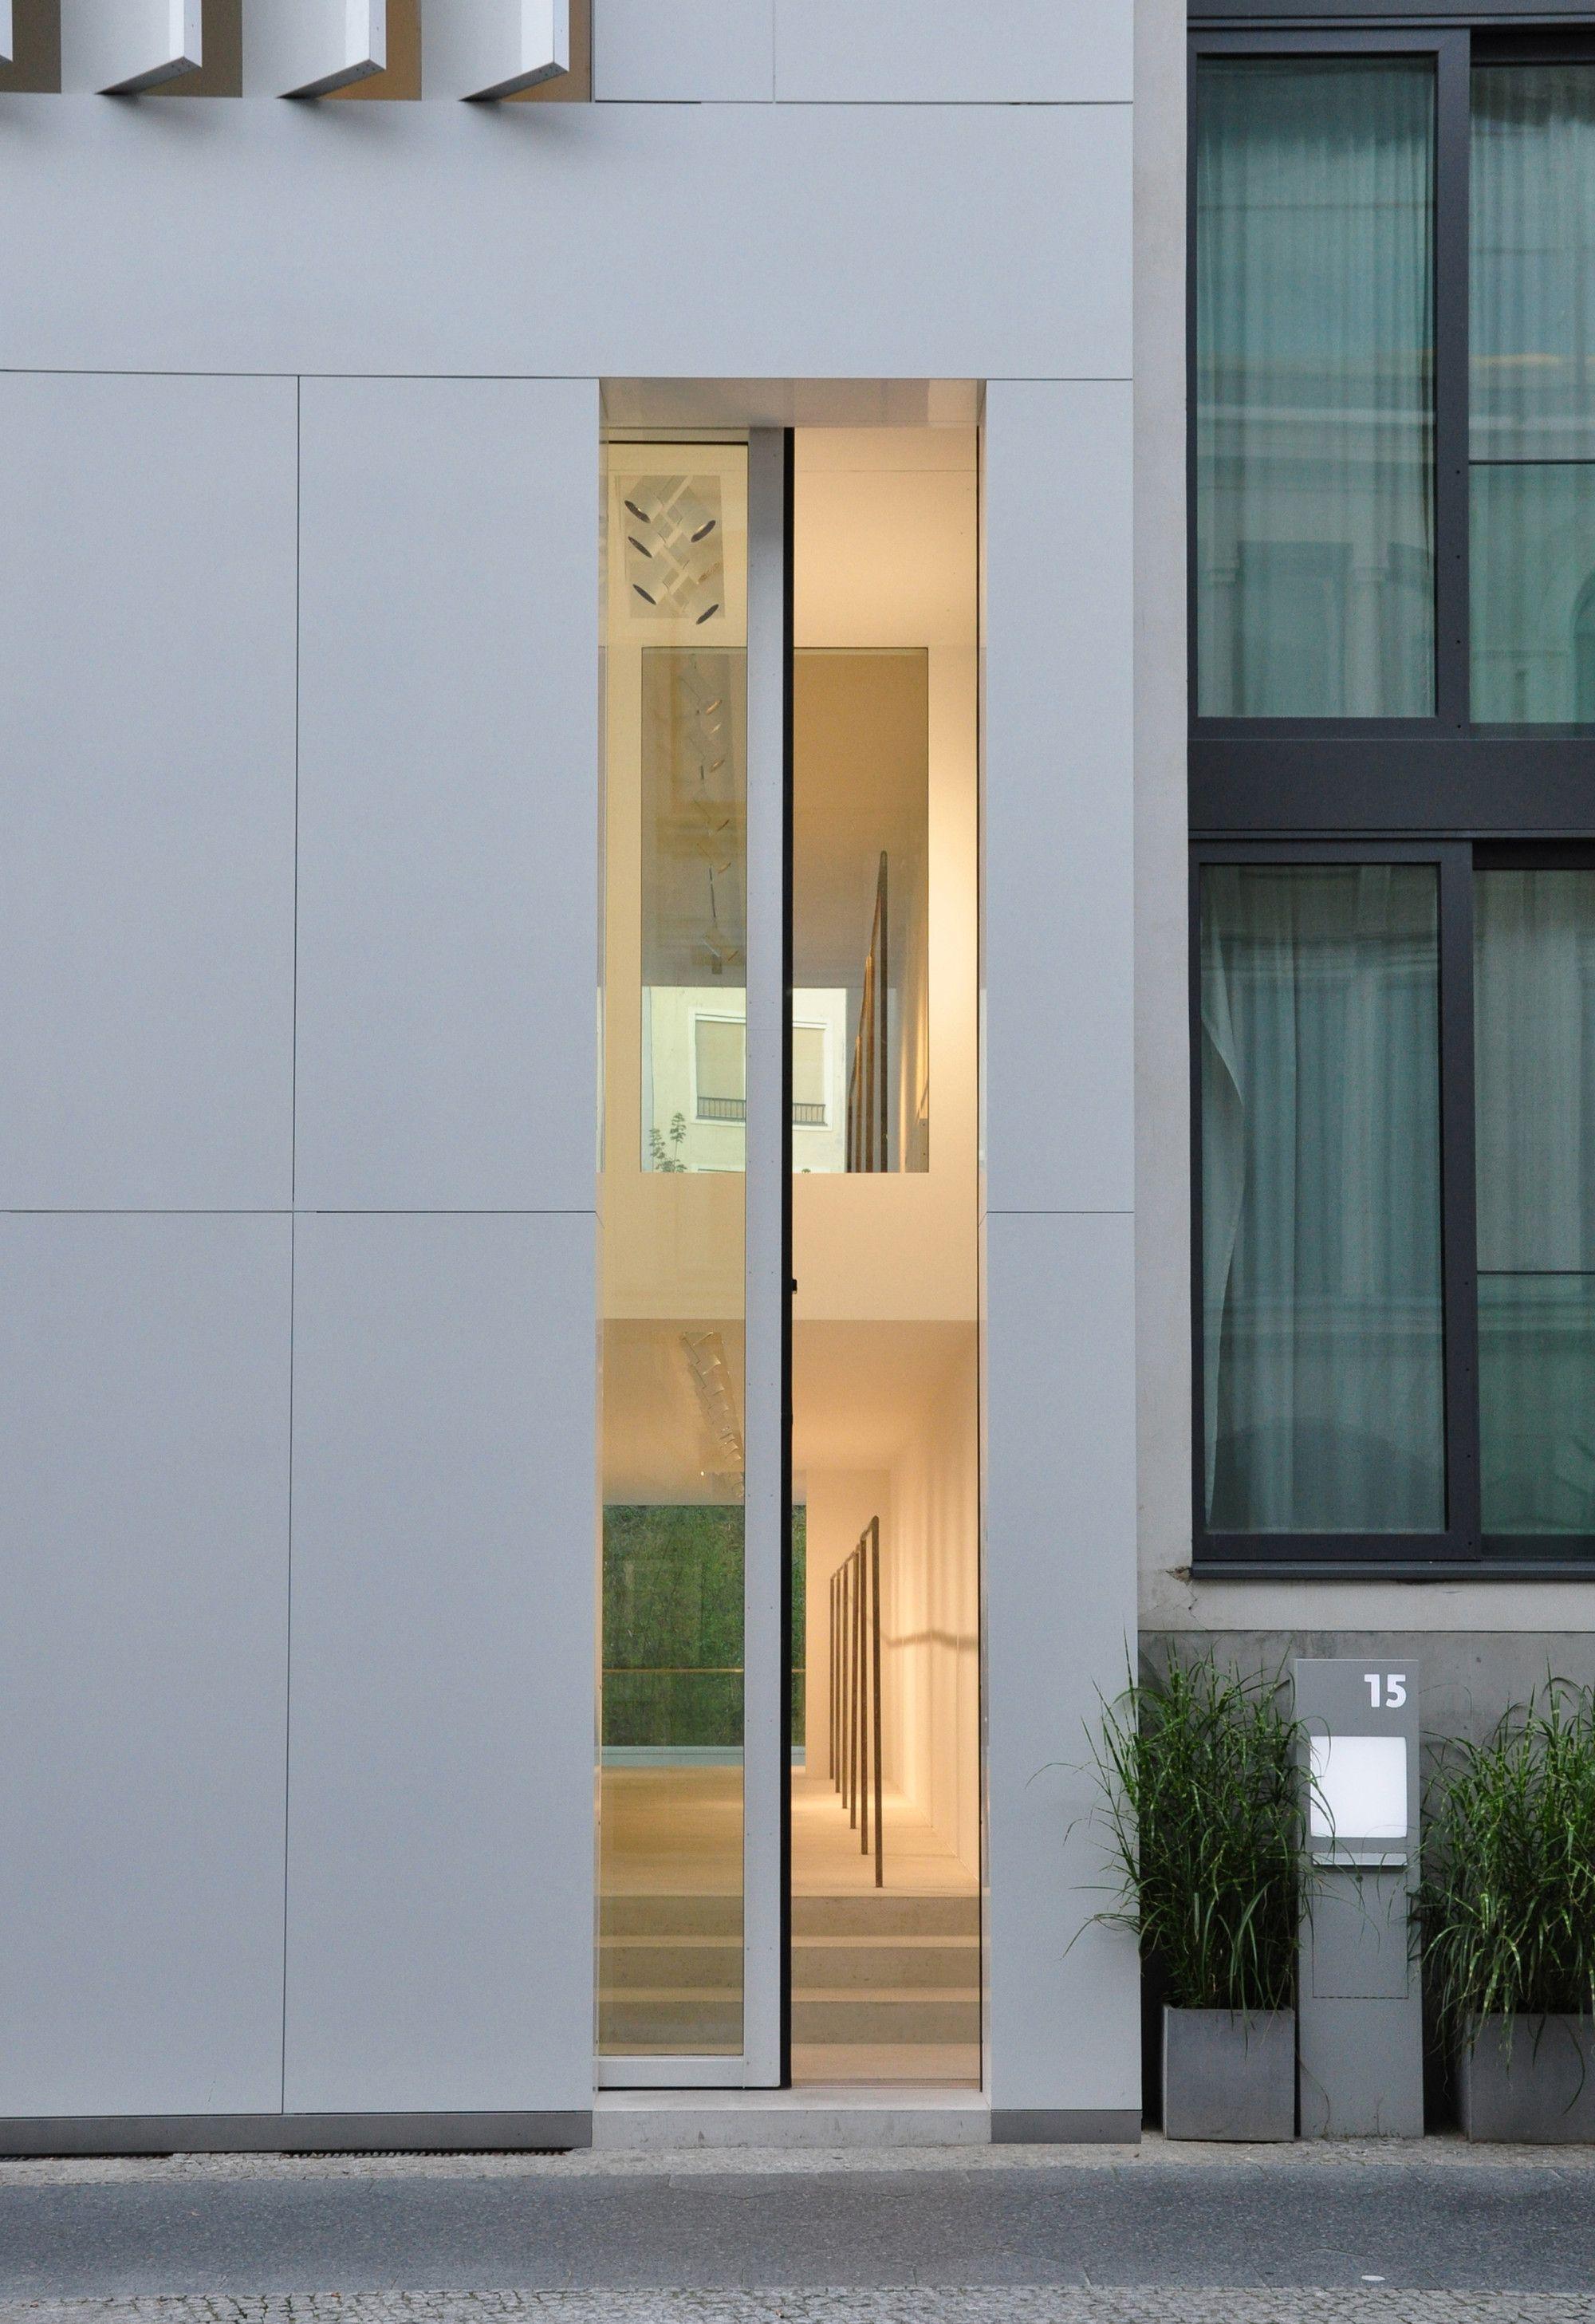 Townhouse Oberwall / Apool Architects - hochglanzweiß lackierte Aluminiumpaneele